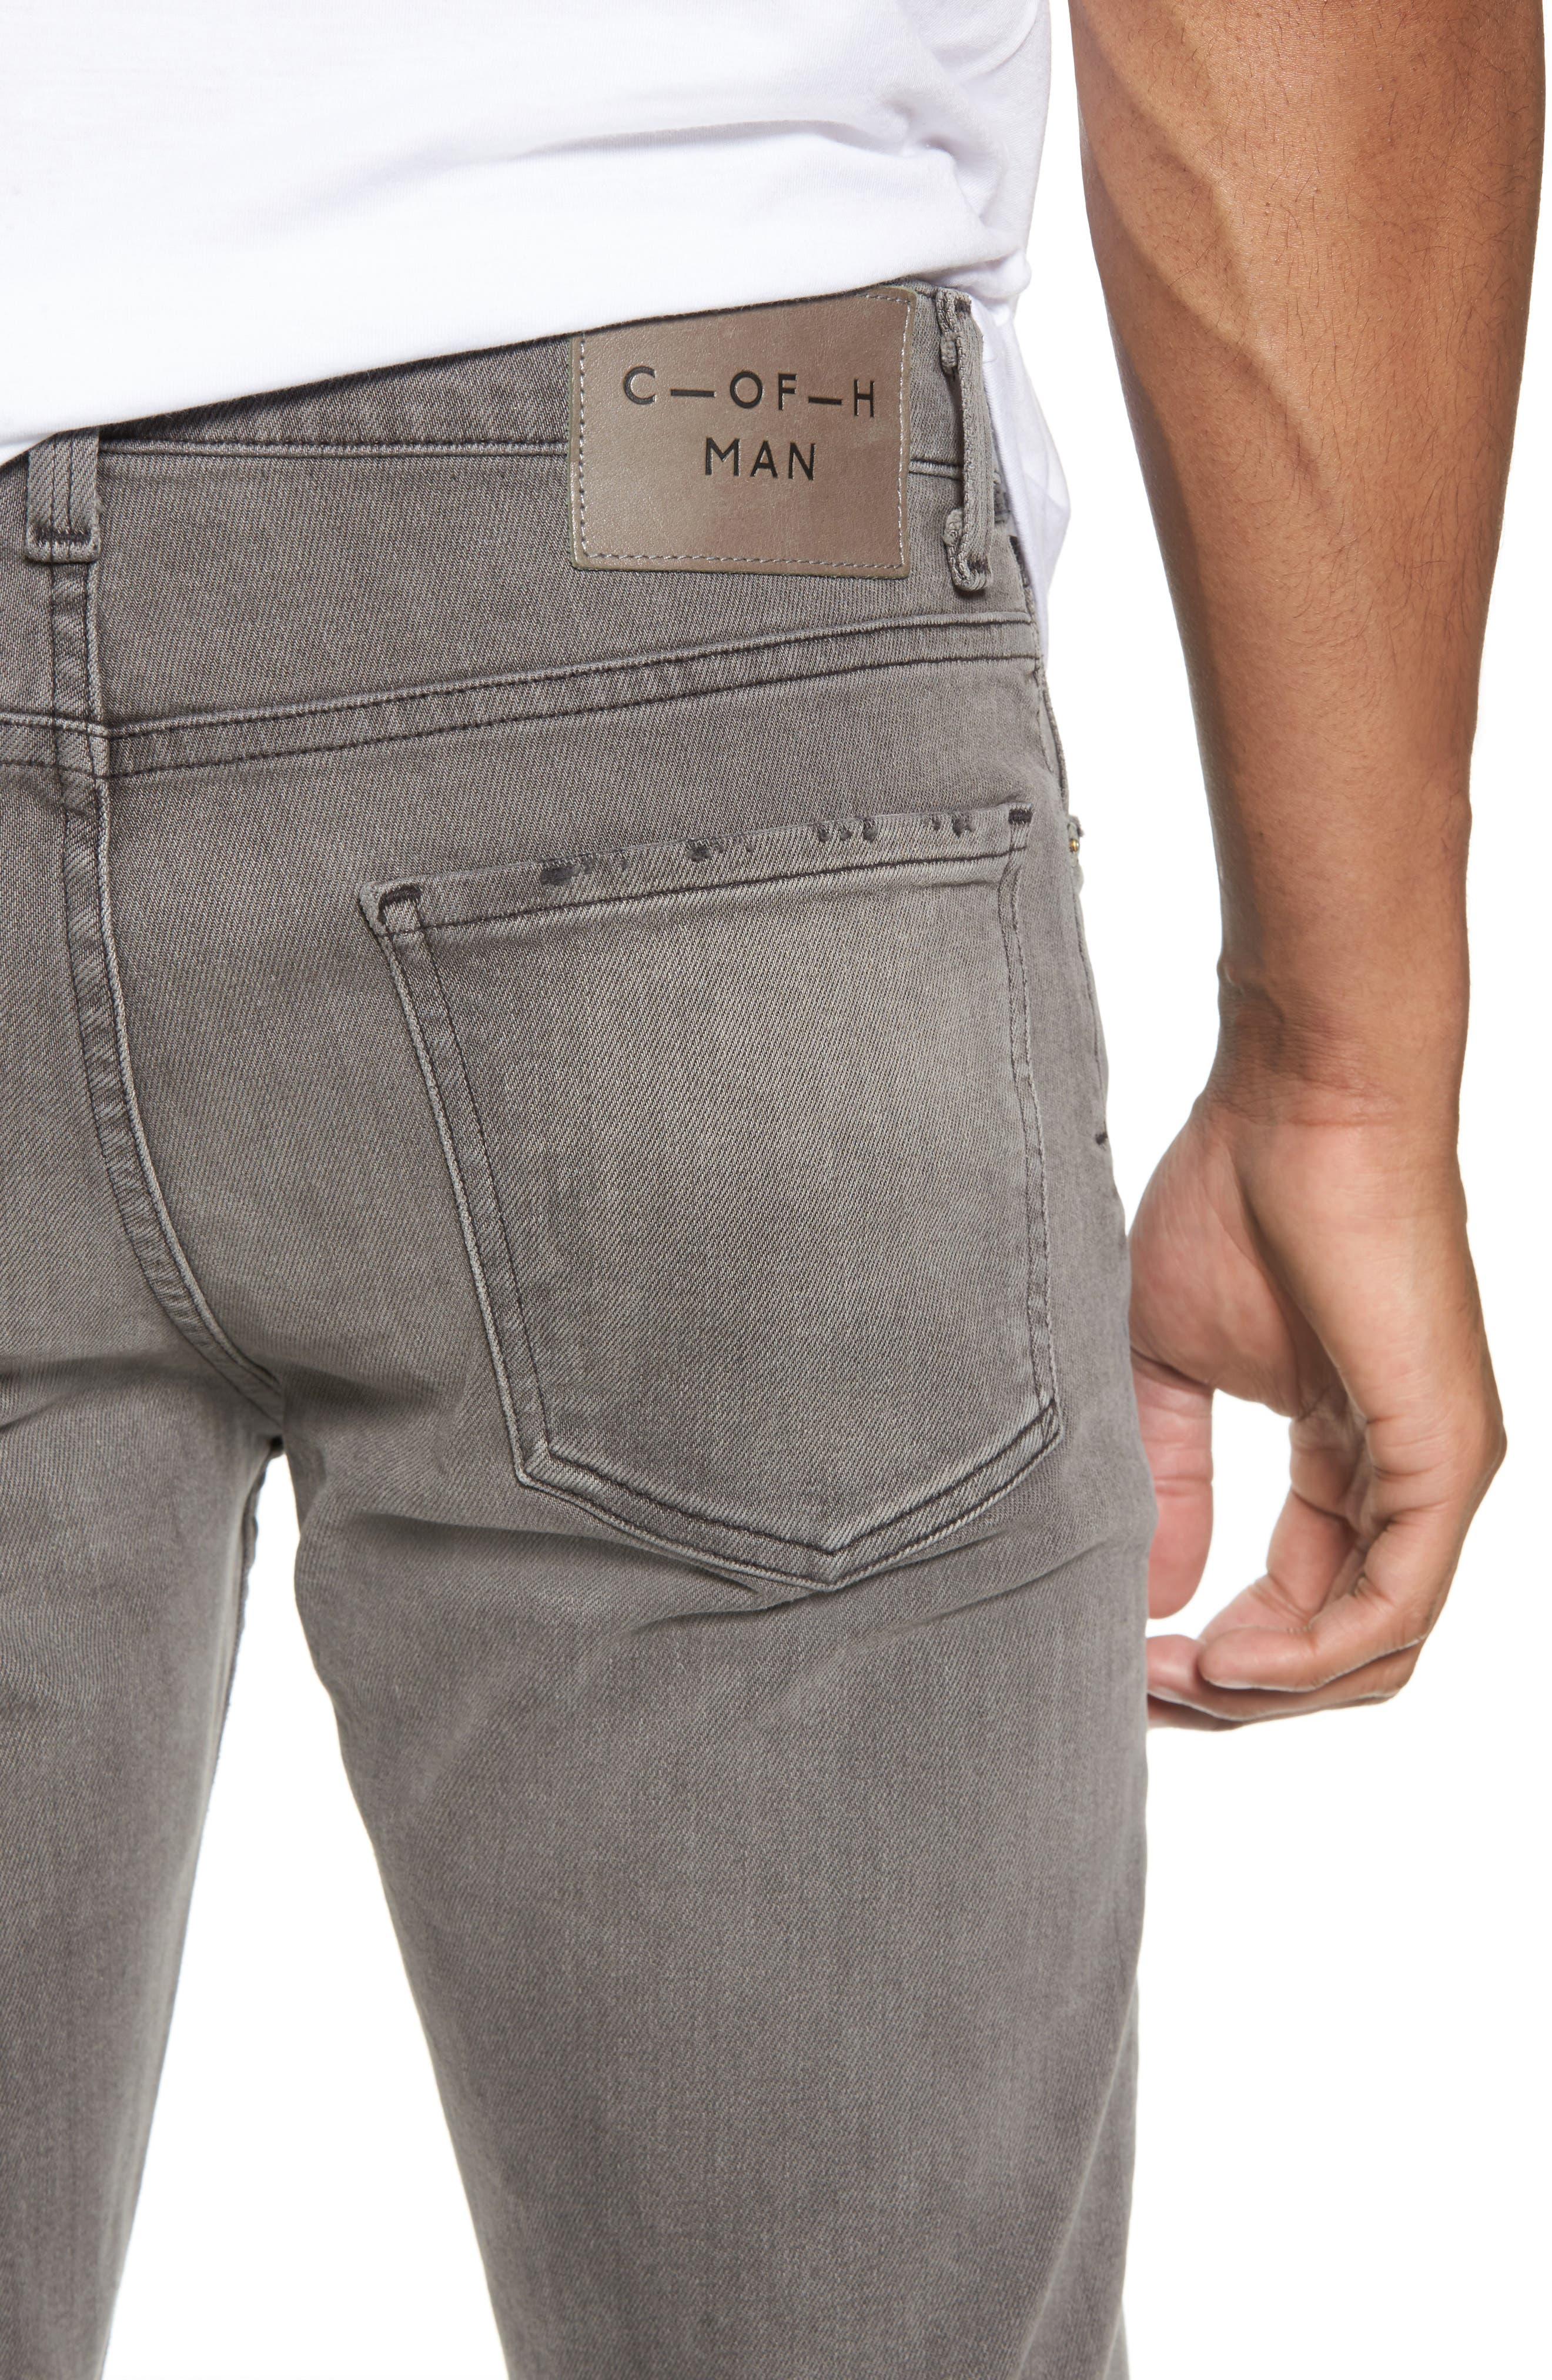 Bowery Slim Fit Jeans,                             Alternate thumbnail 4, color,                             Leon